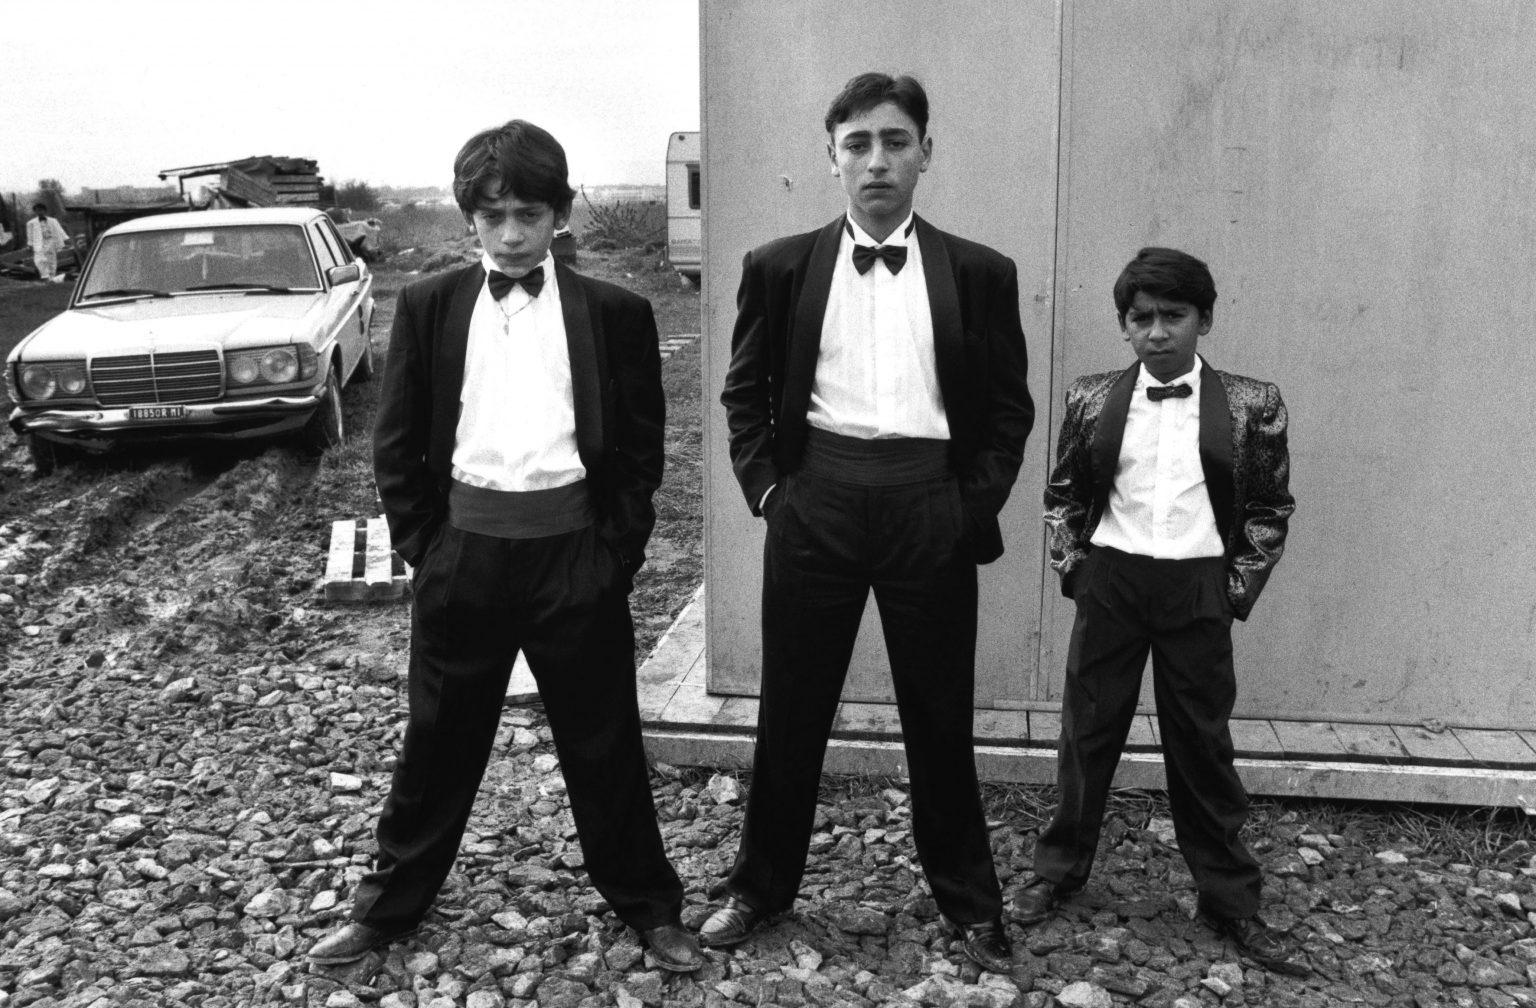 Florence , 1993 - Gypsies dressed for a wedding >< Firenze , 1993 - Zingari vestiti per un matrimonio